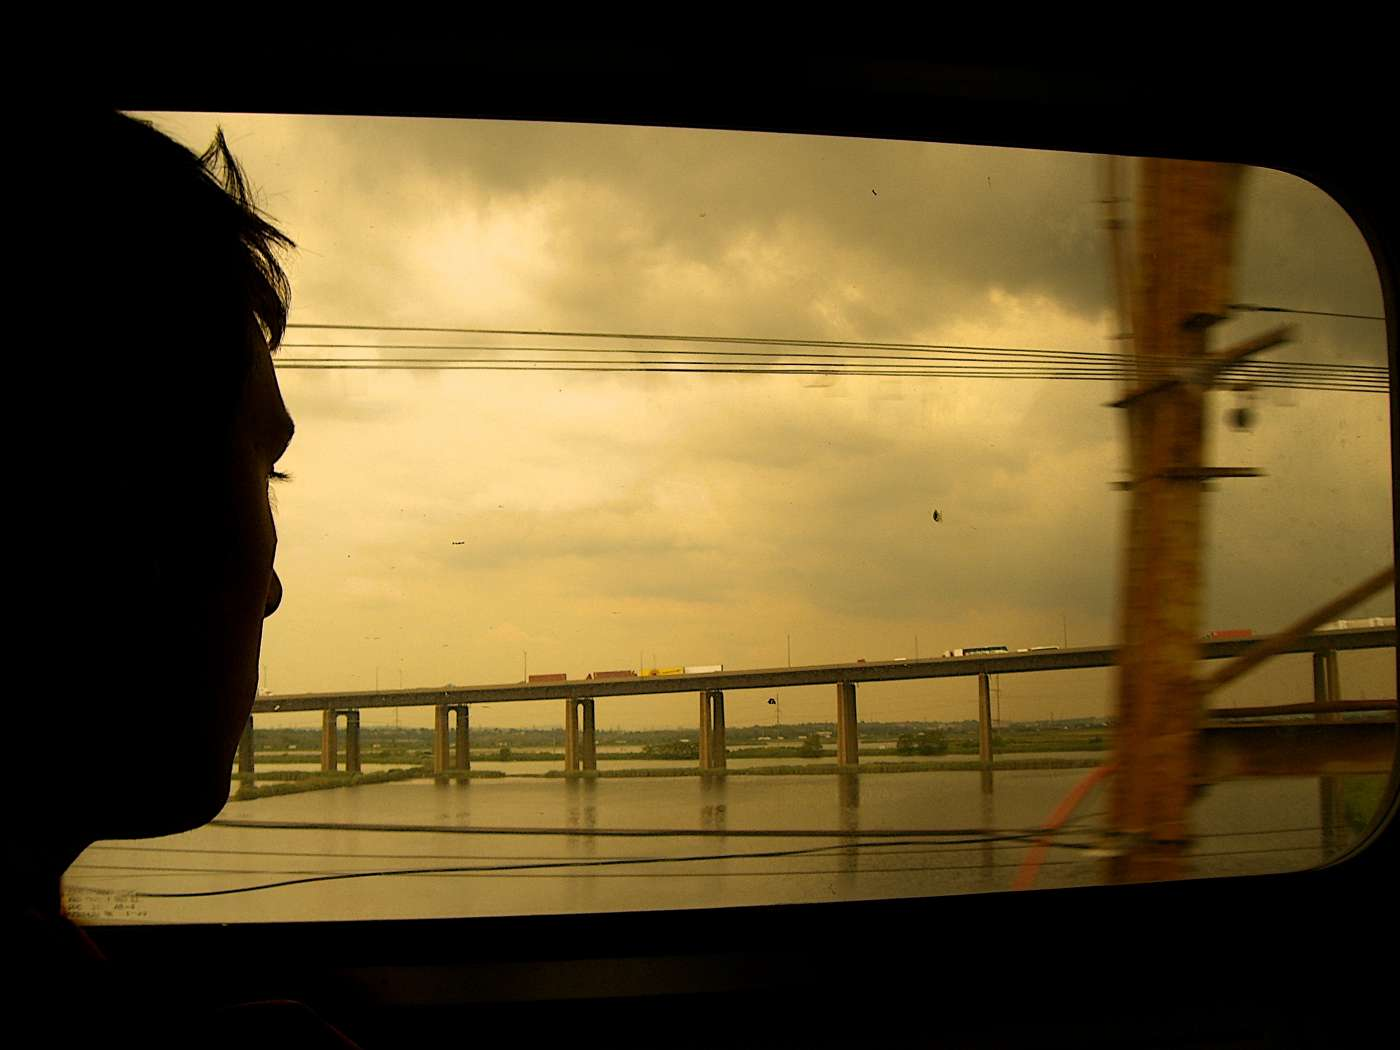 Travelling, Matt Perich